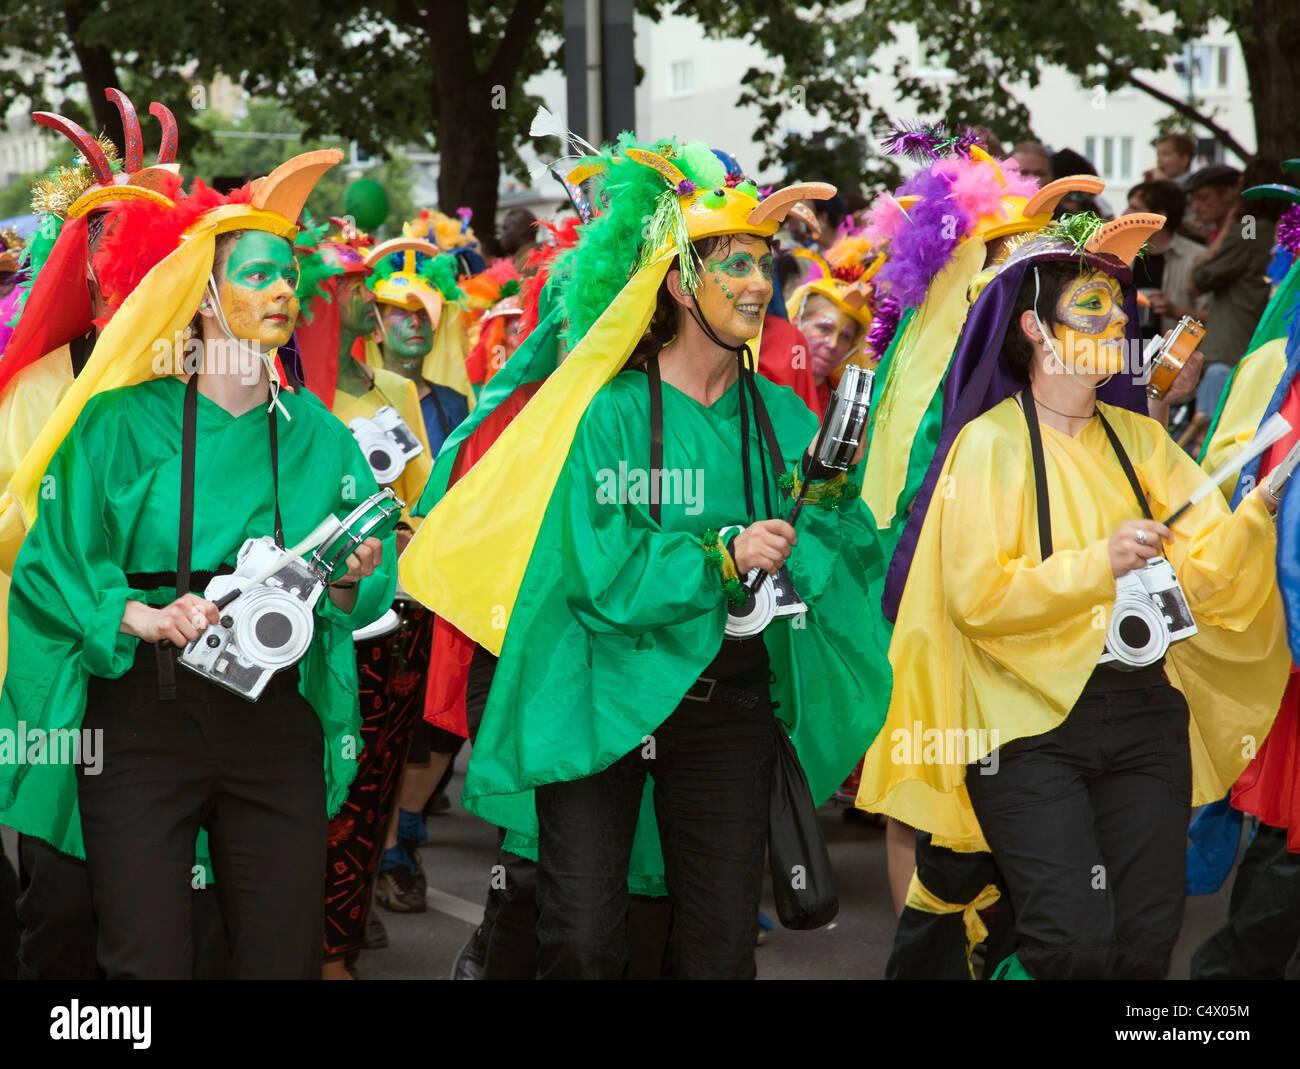 Carnaval de las Culturas, Berlín 2011 Imagen De Stock